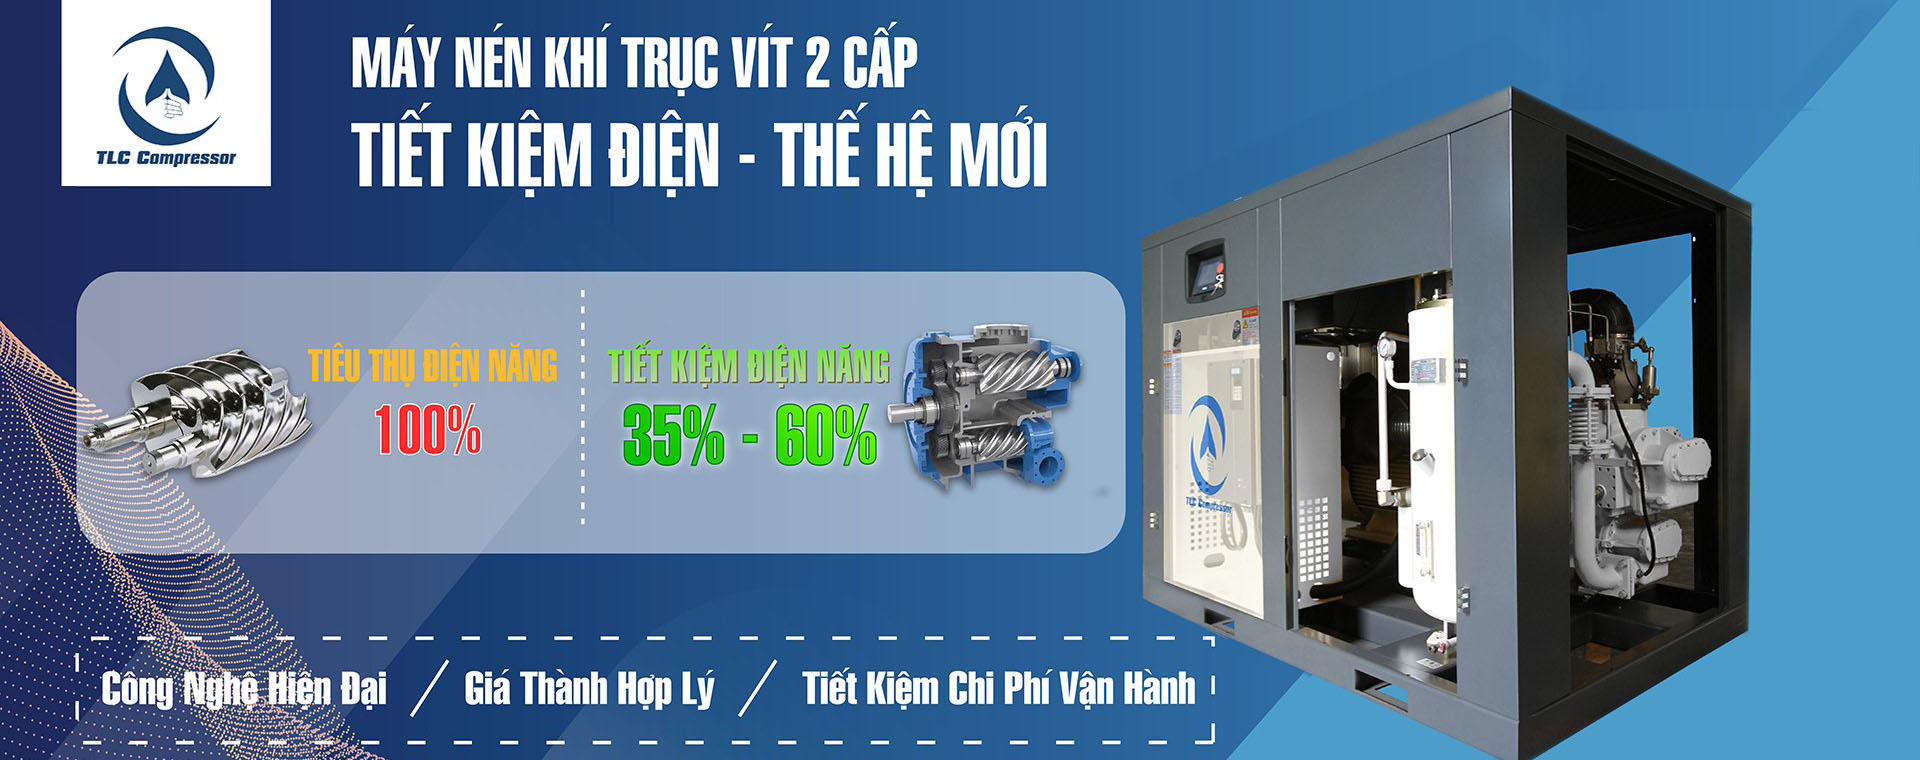 slide-may-nen-khi-tlc-compressor-home (4)